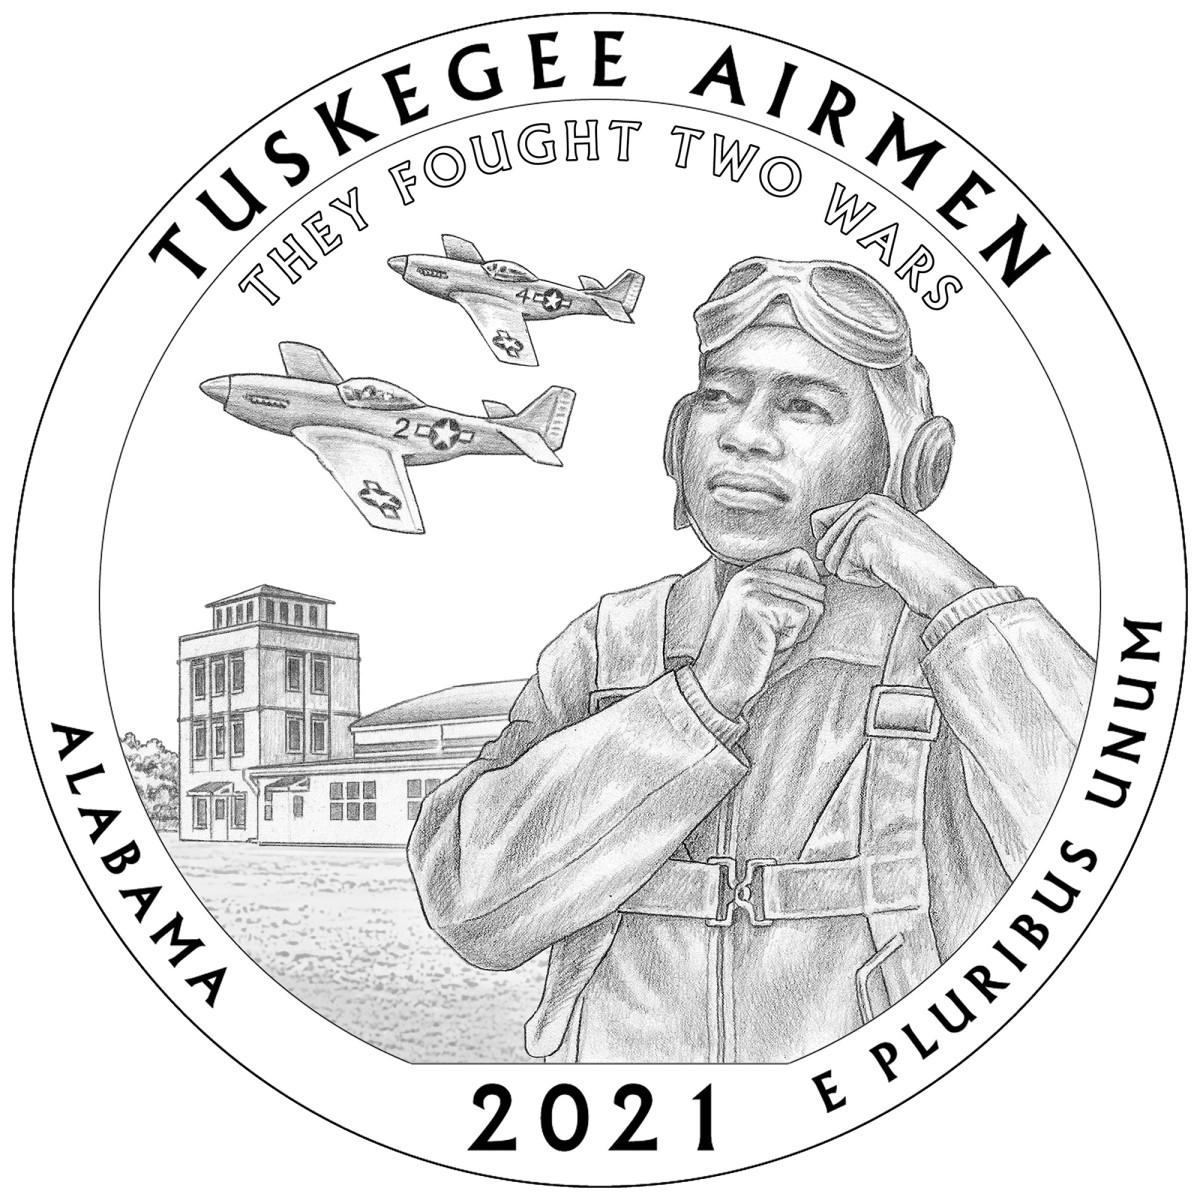 Tuskeegee airmen 2021